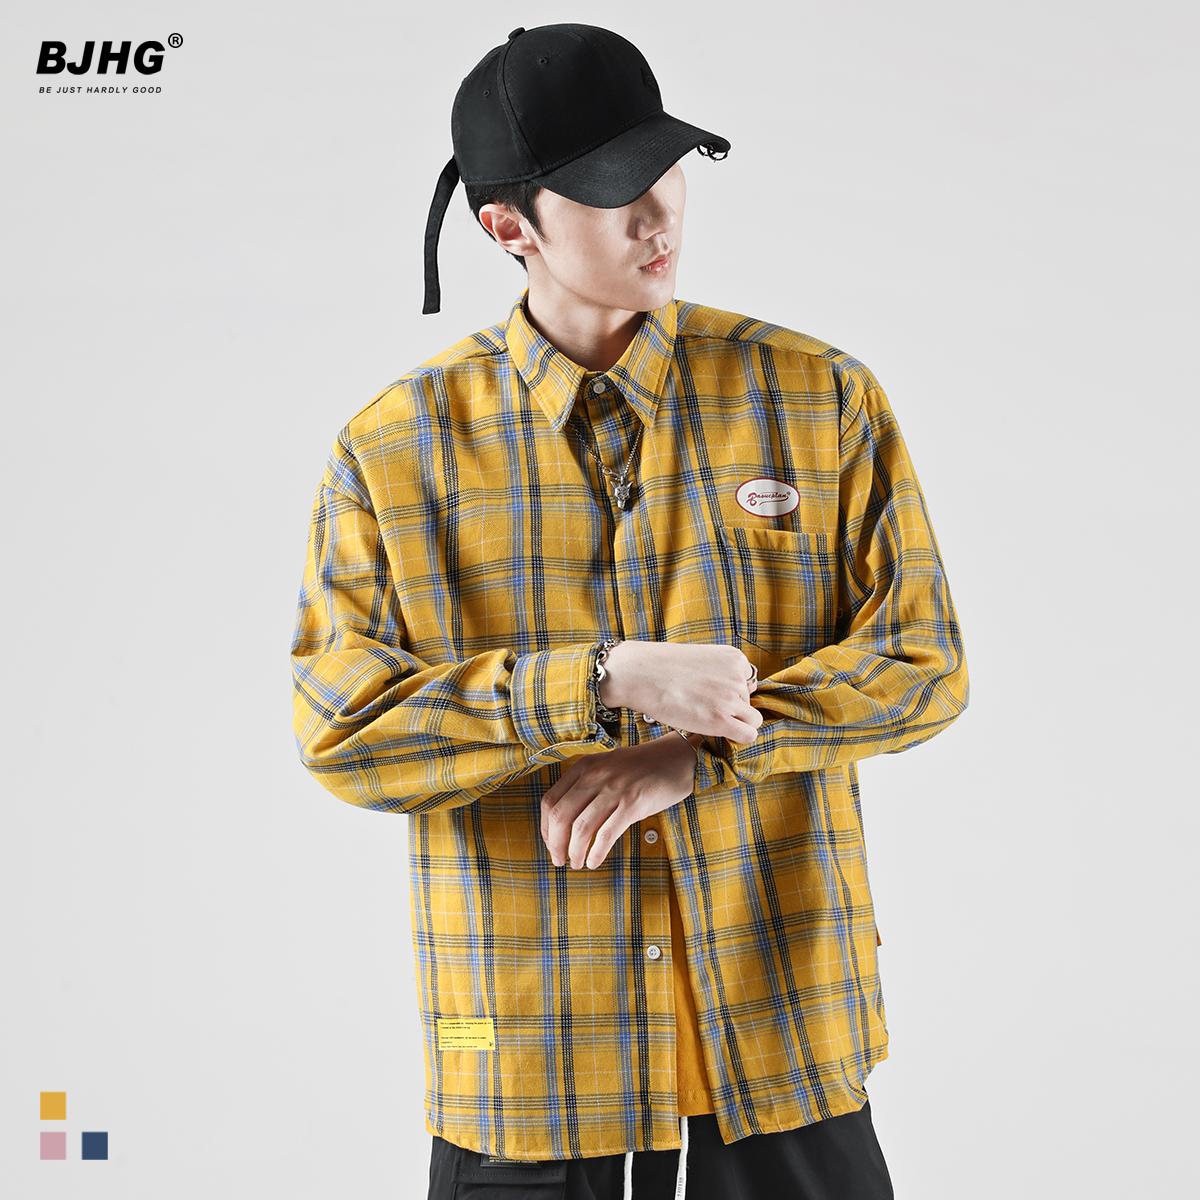 BJHG不计后果秋韩版衬衣格子衫男潮牌英伦风复古嘻哈宽松长袖衬衫(非品牌)